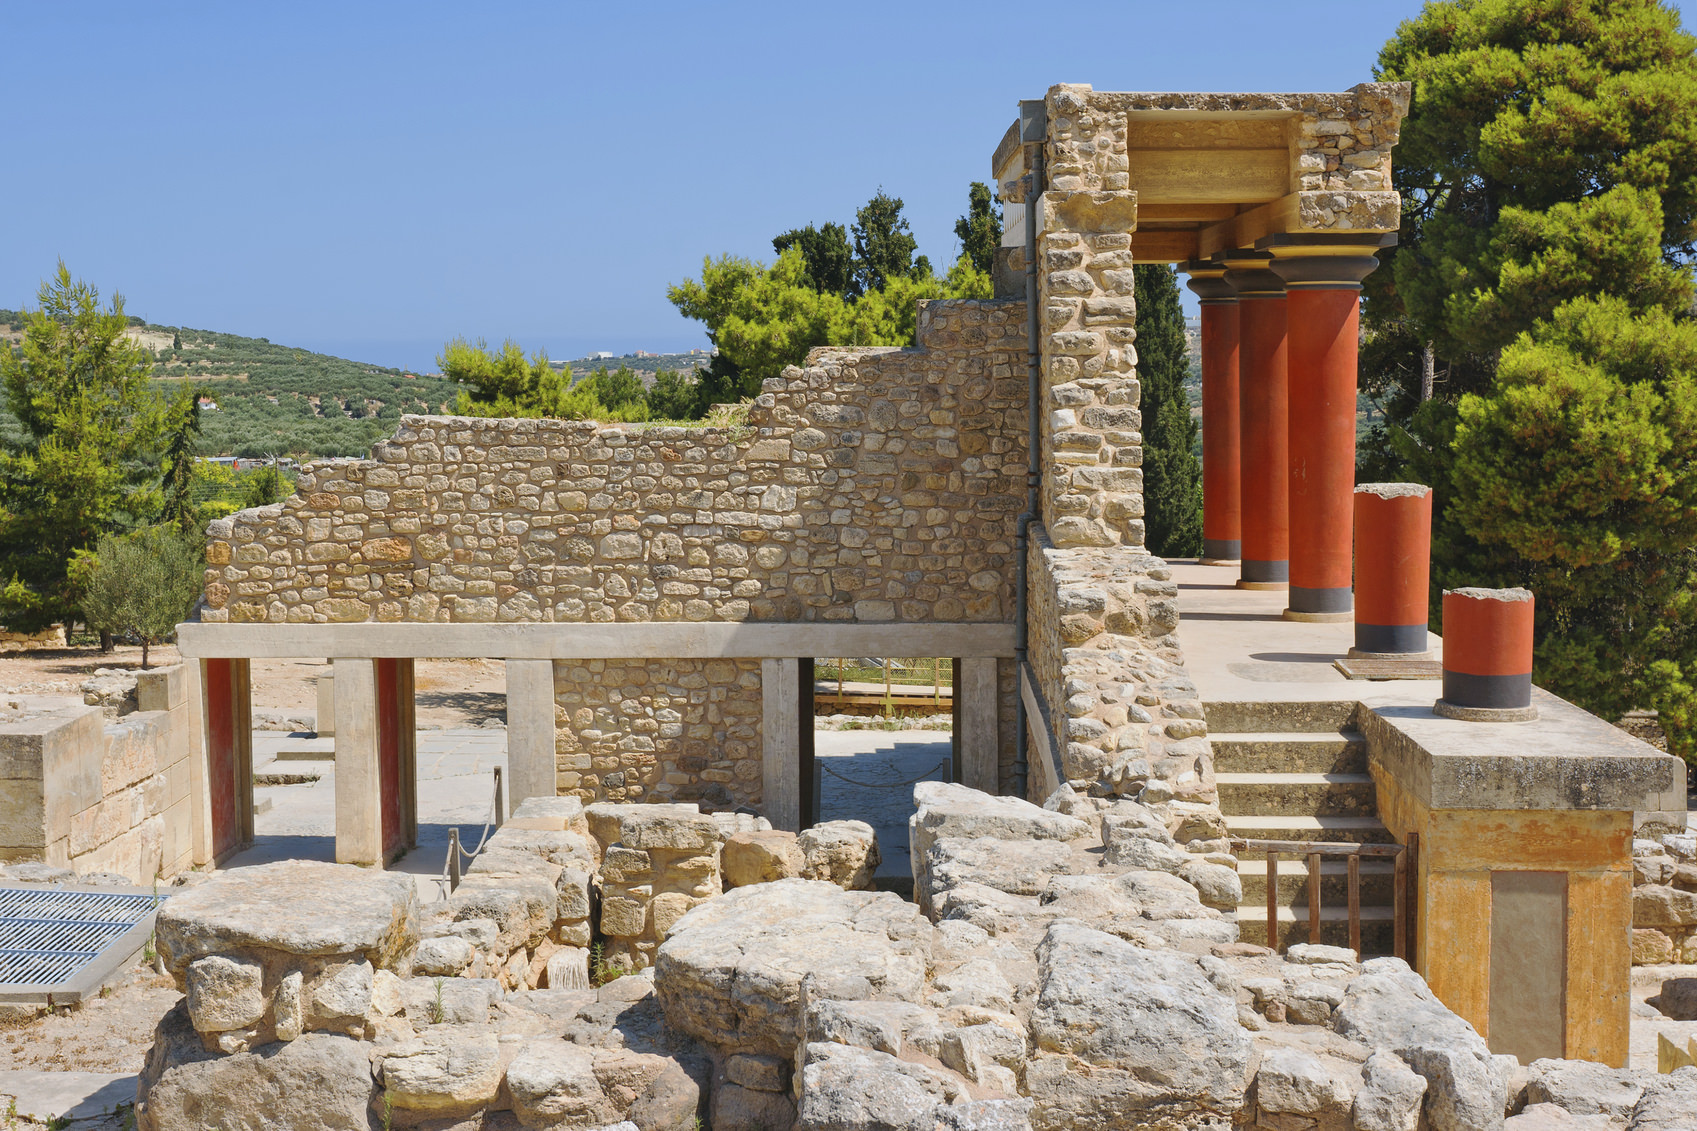 North Entrance of Knossos palace. Crete, Greece